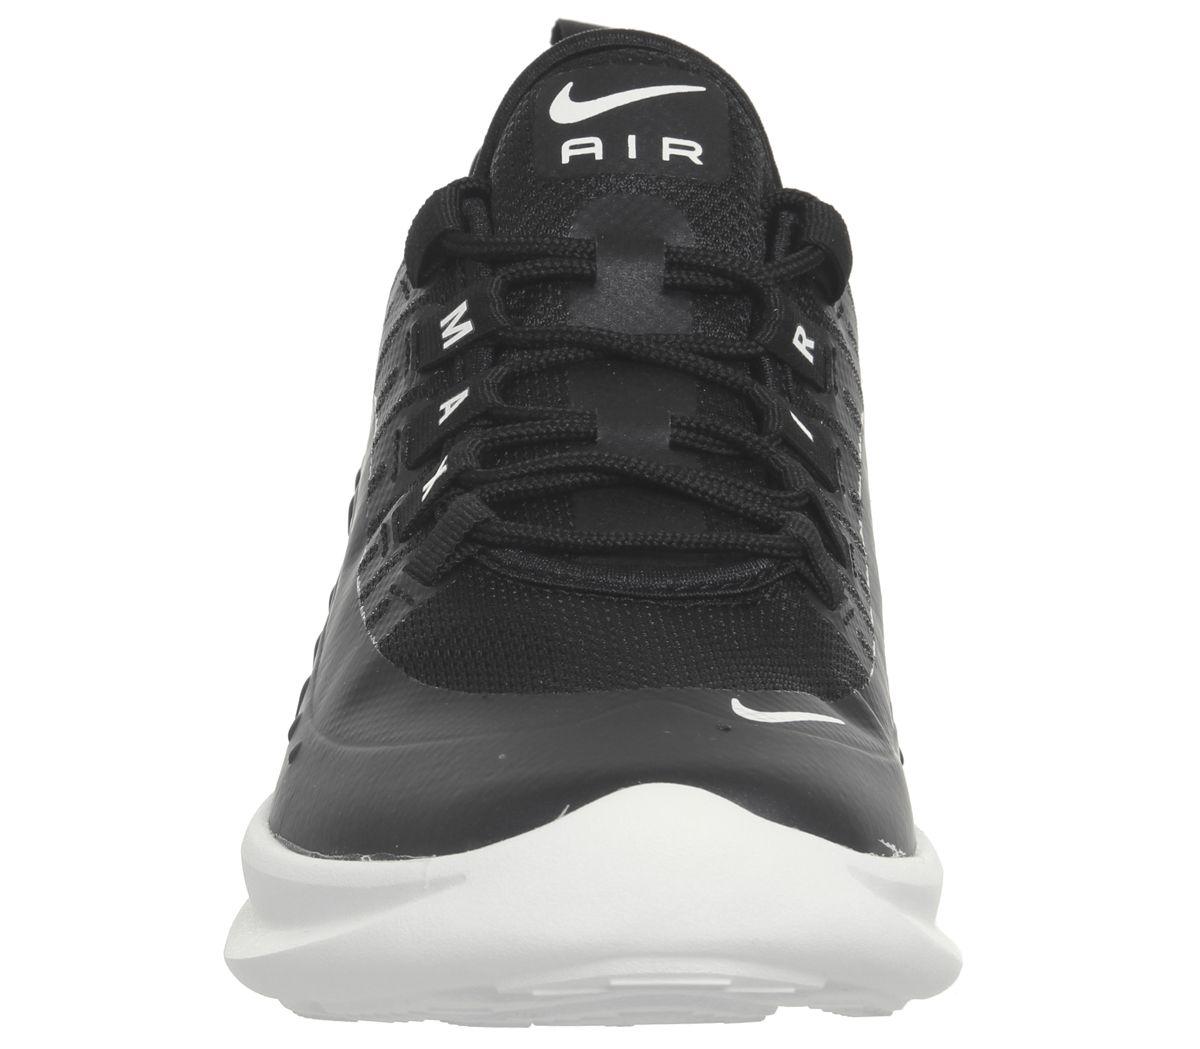 9672dcb6c6 Nike Air Max Axis Trainers Black White - Unisex